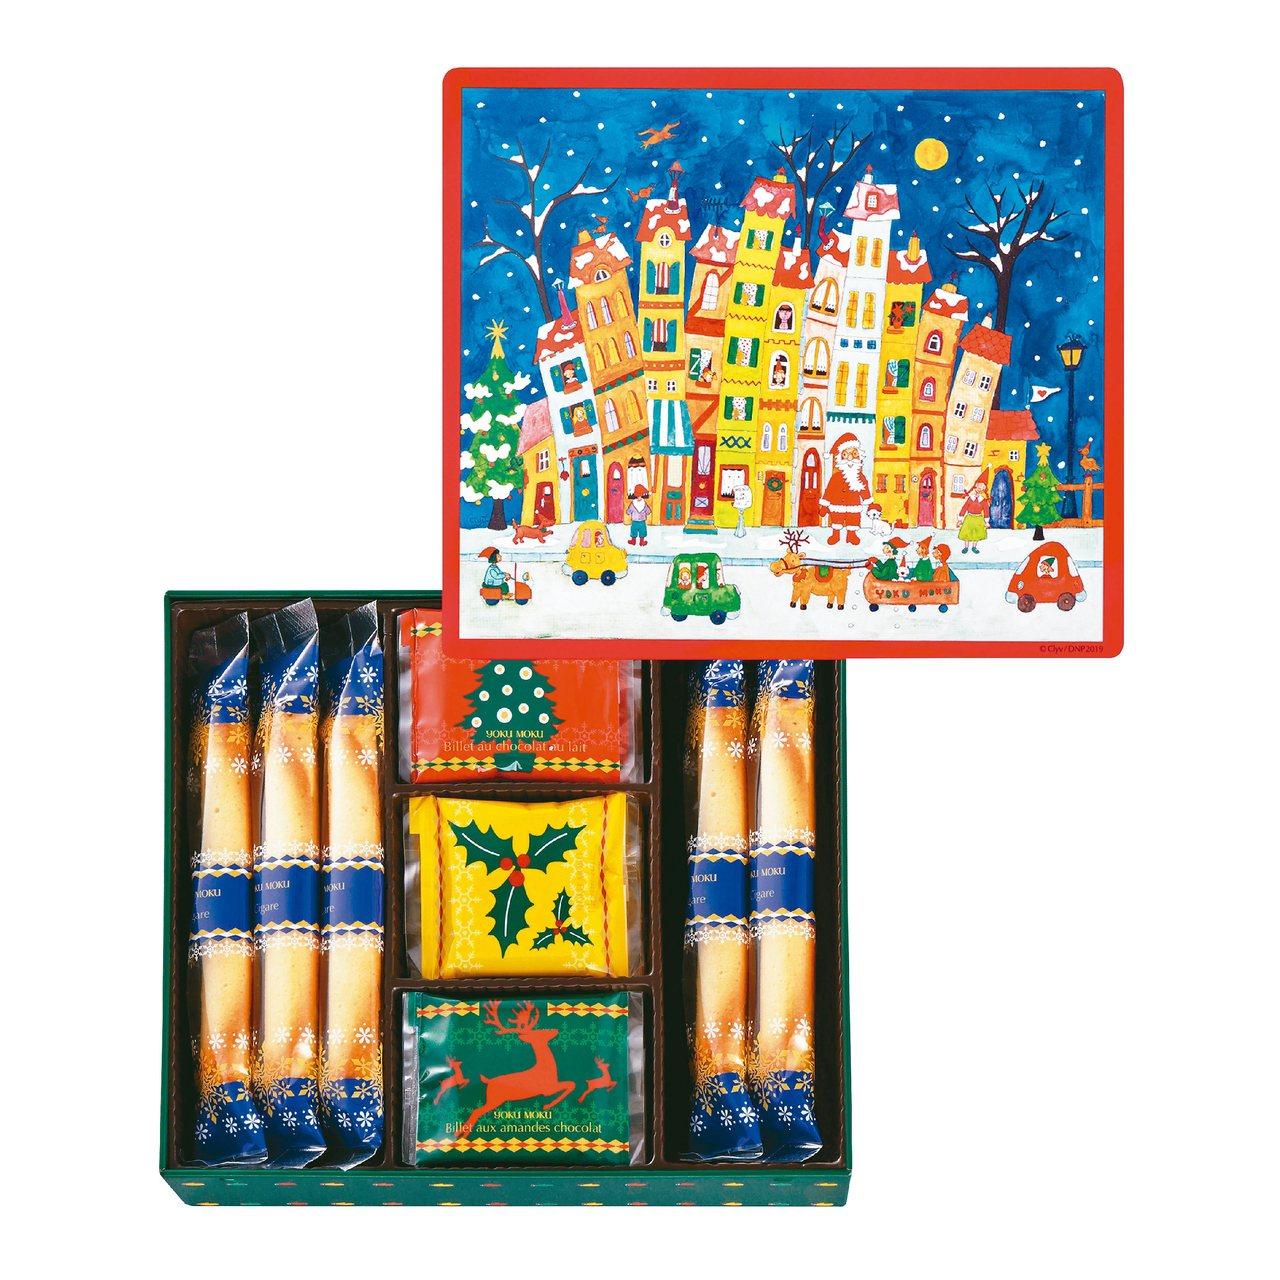 YOKU MOKU與法國知名插畫家CLYV合作的兩款耶誕限定禮盒。 圖/YOKU...